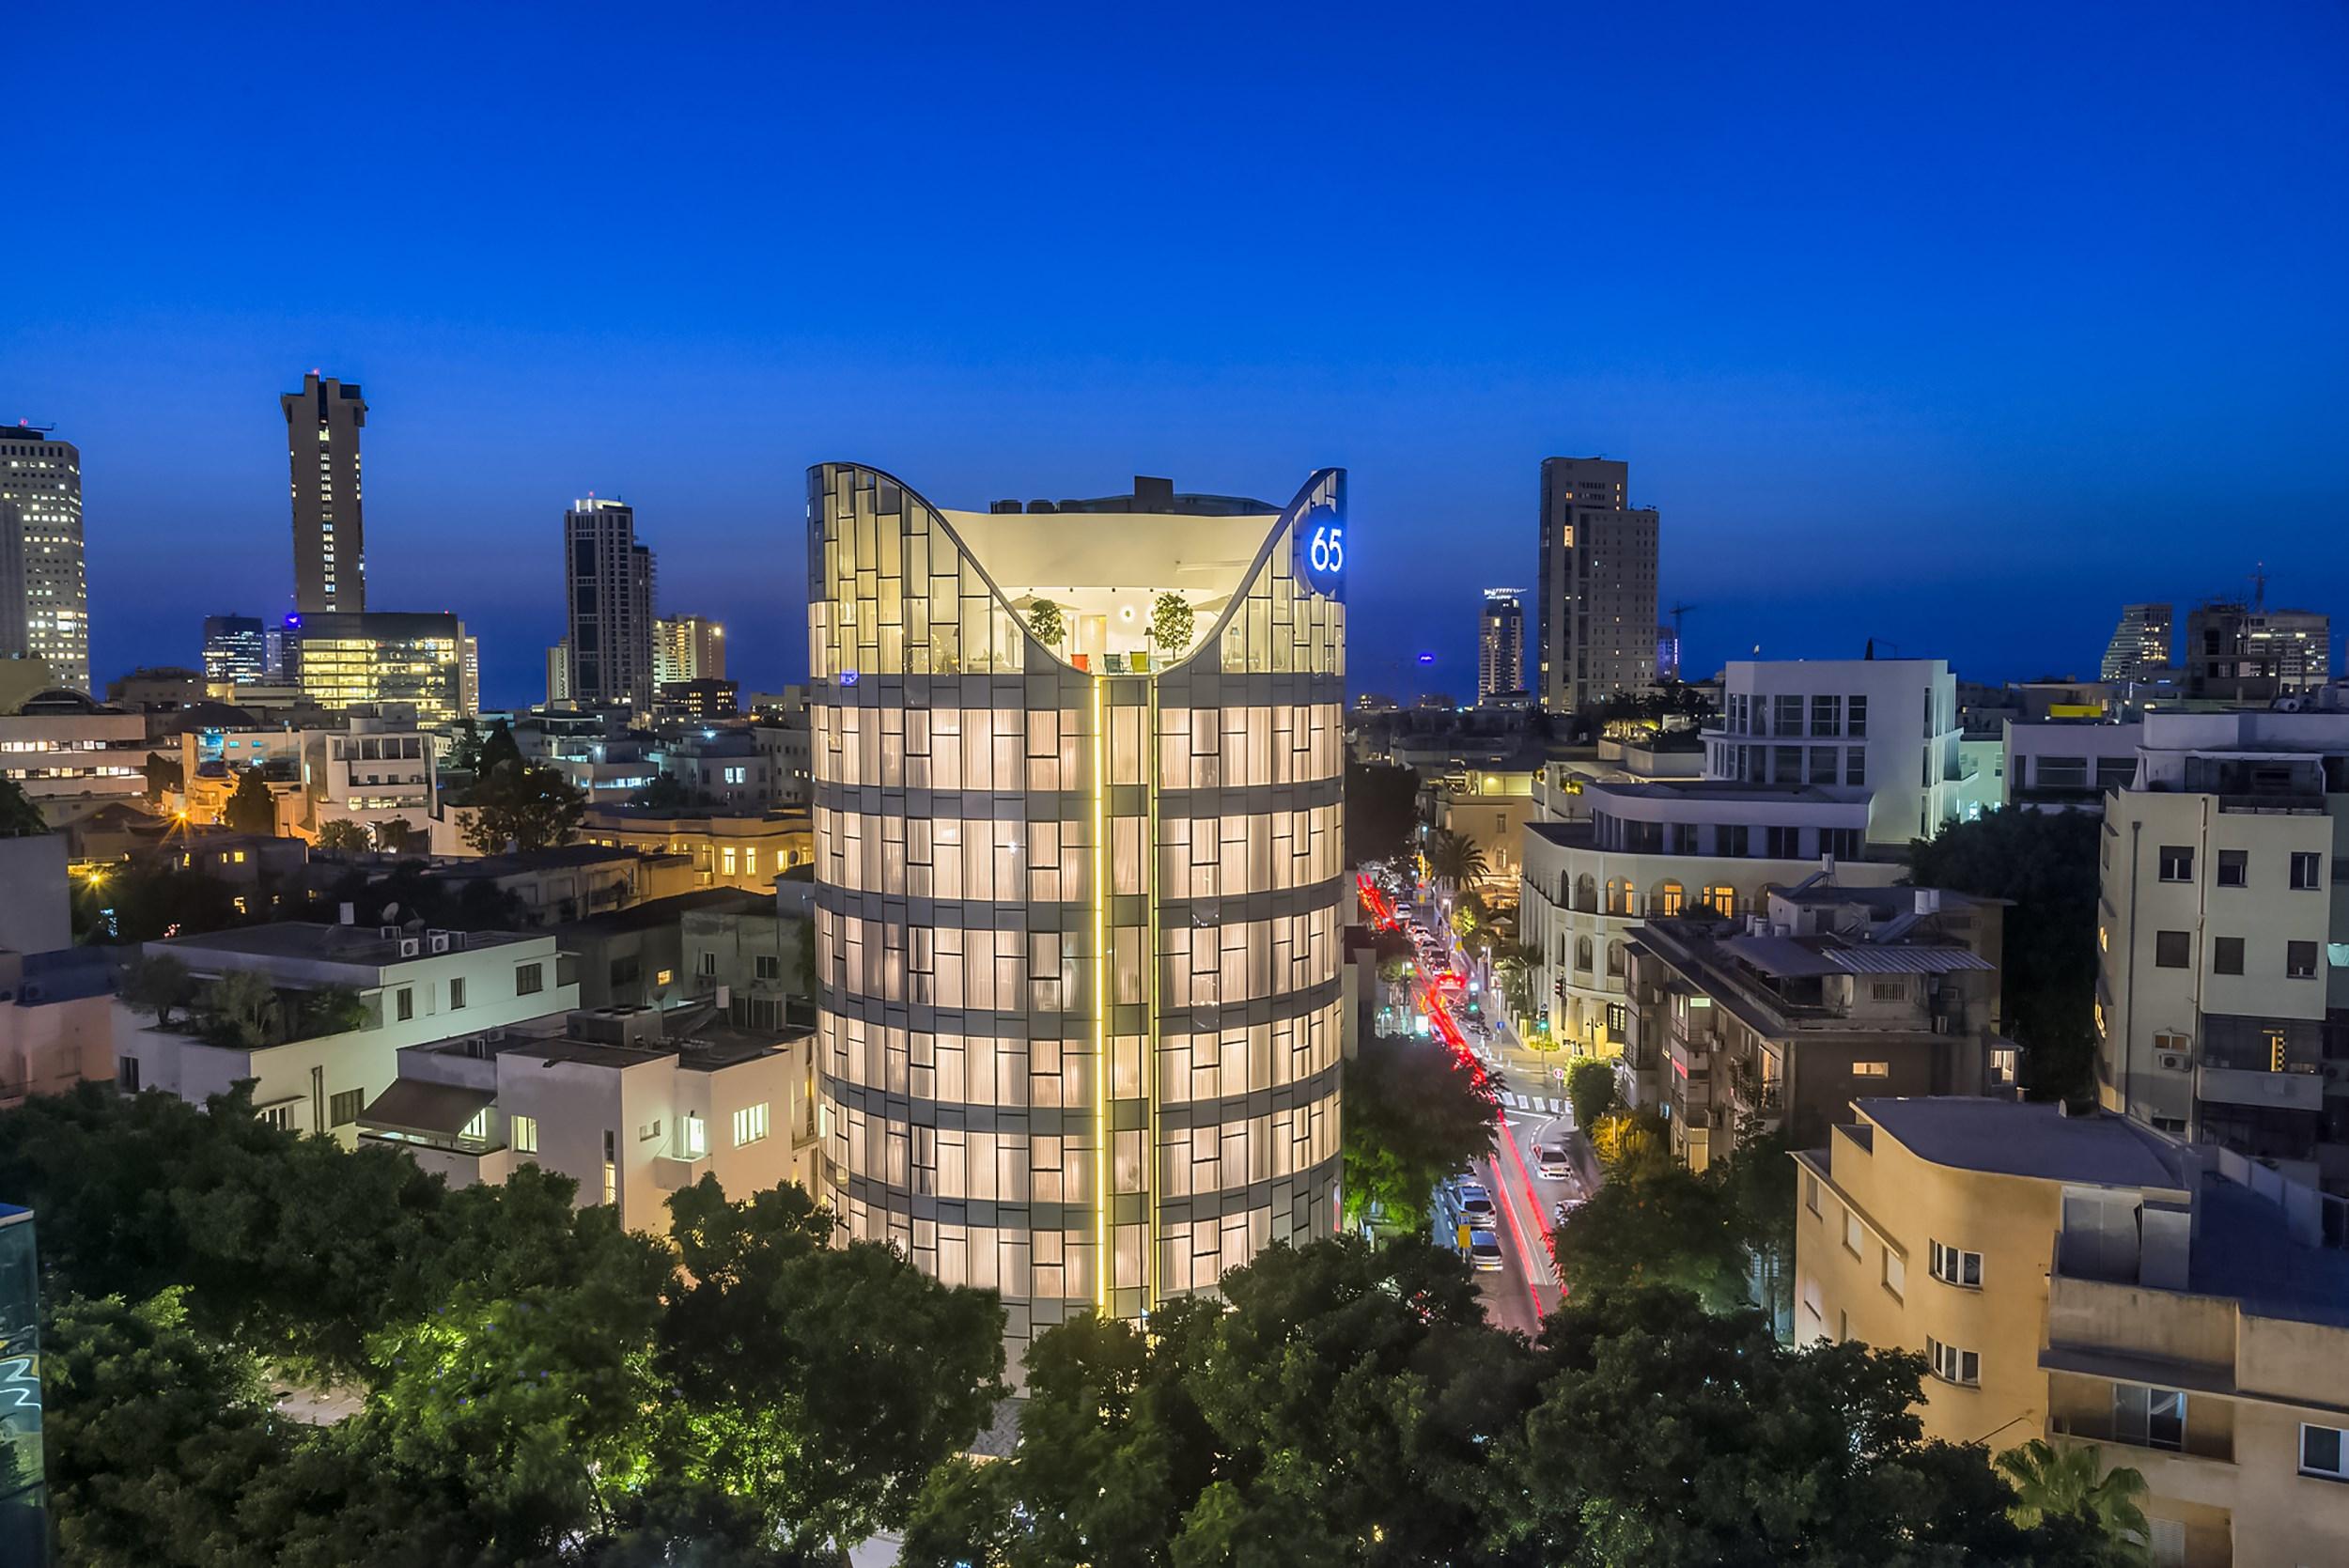 65-hotel-evening